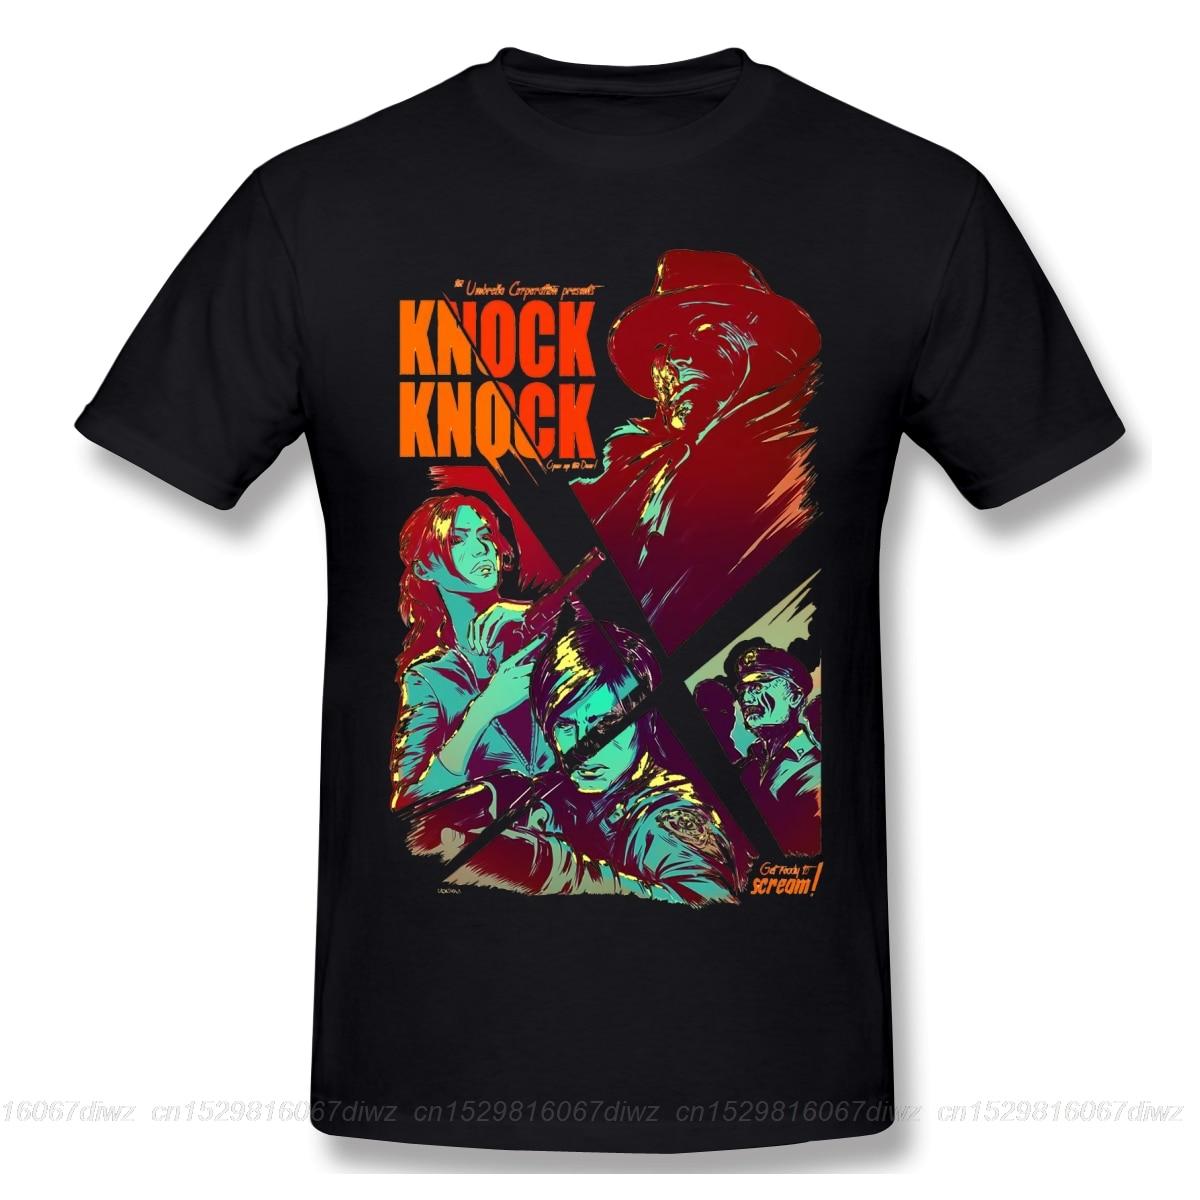 Camiseta de Resident evil, camiseta roja 6xl, camiseta bonita, camiseta gráfica a la moda para hombres con golpes, camiseta de algodón 100 de manga corta